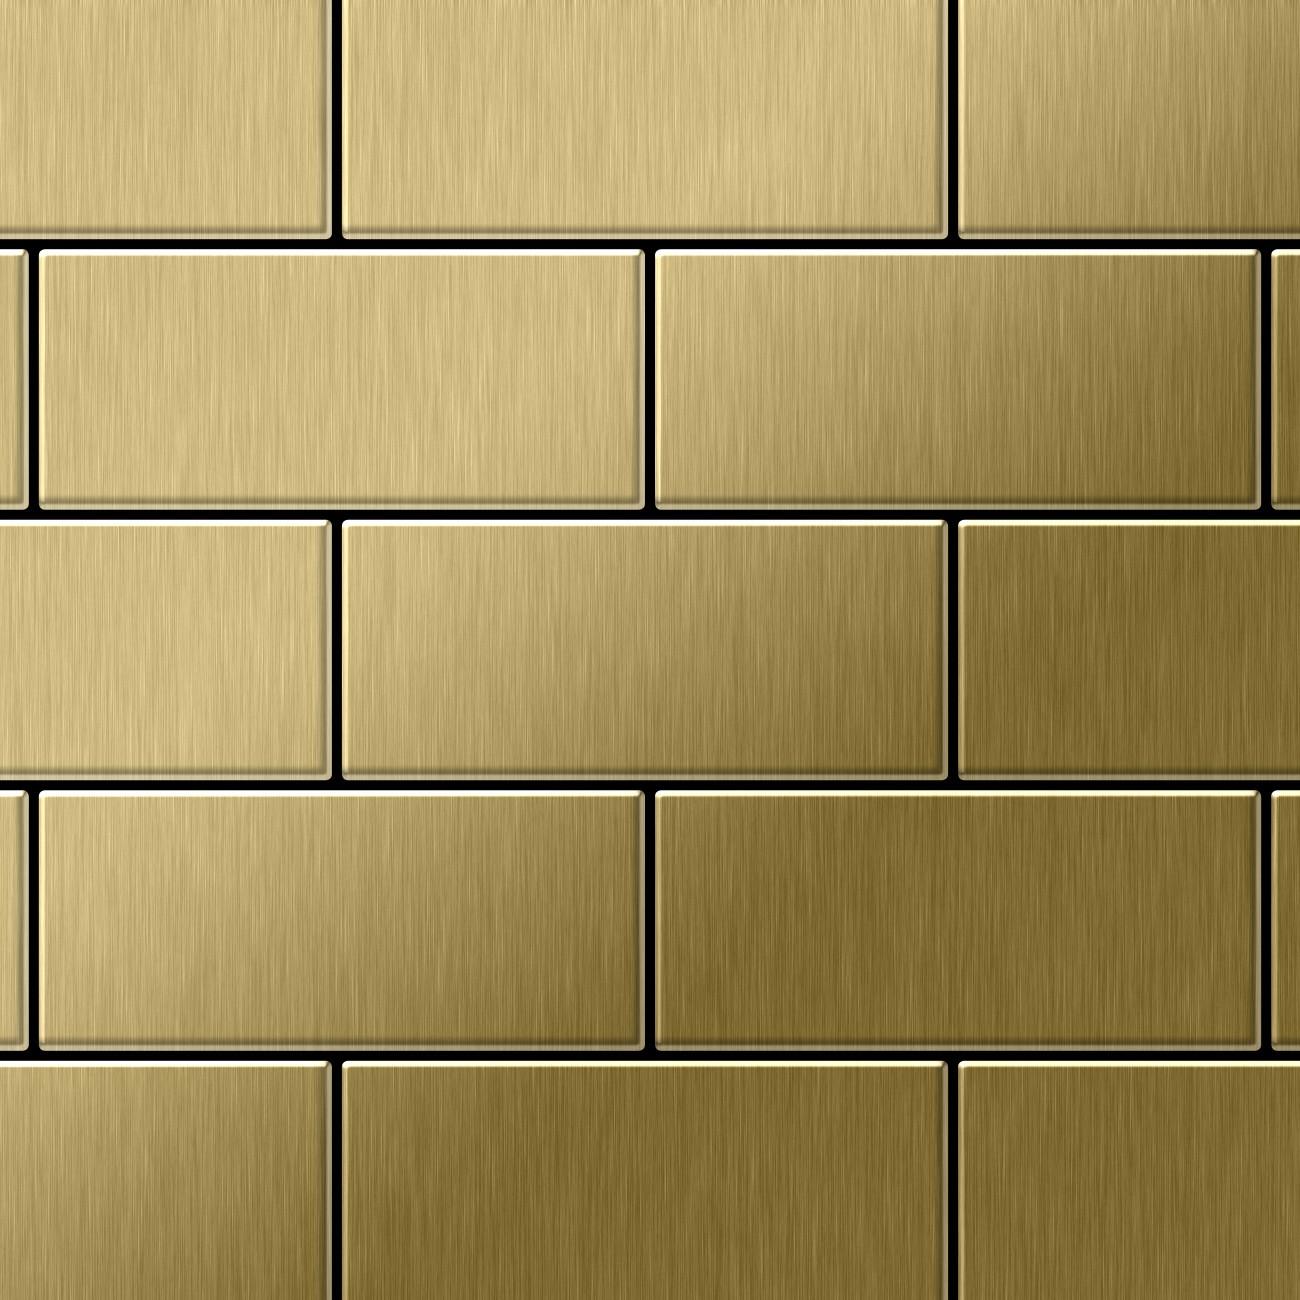 Mosaik Fliese Massiv Metall Titan Geburstet In Gold 1 6mm Stark